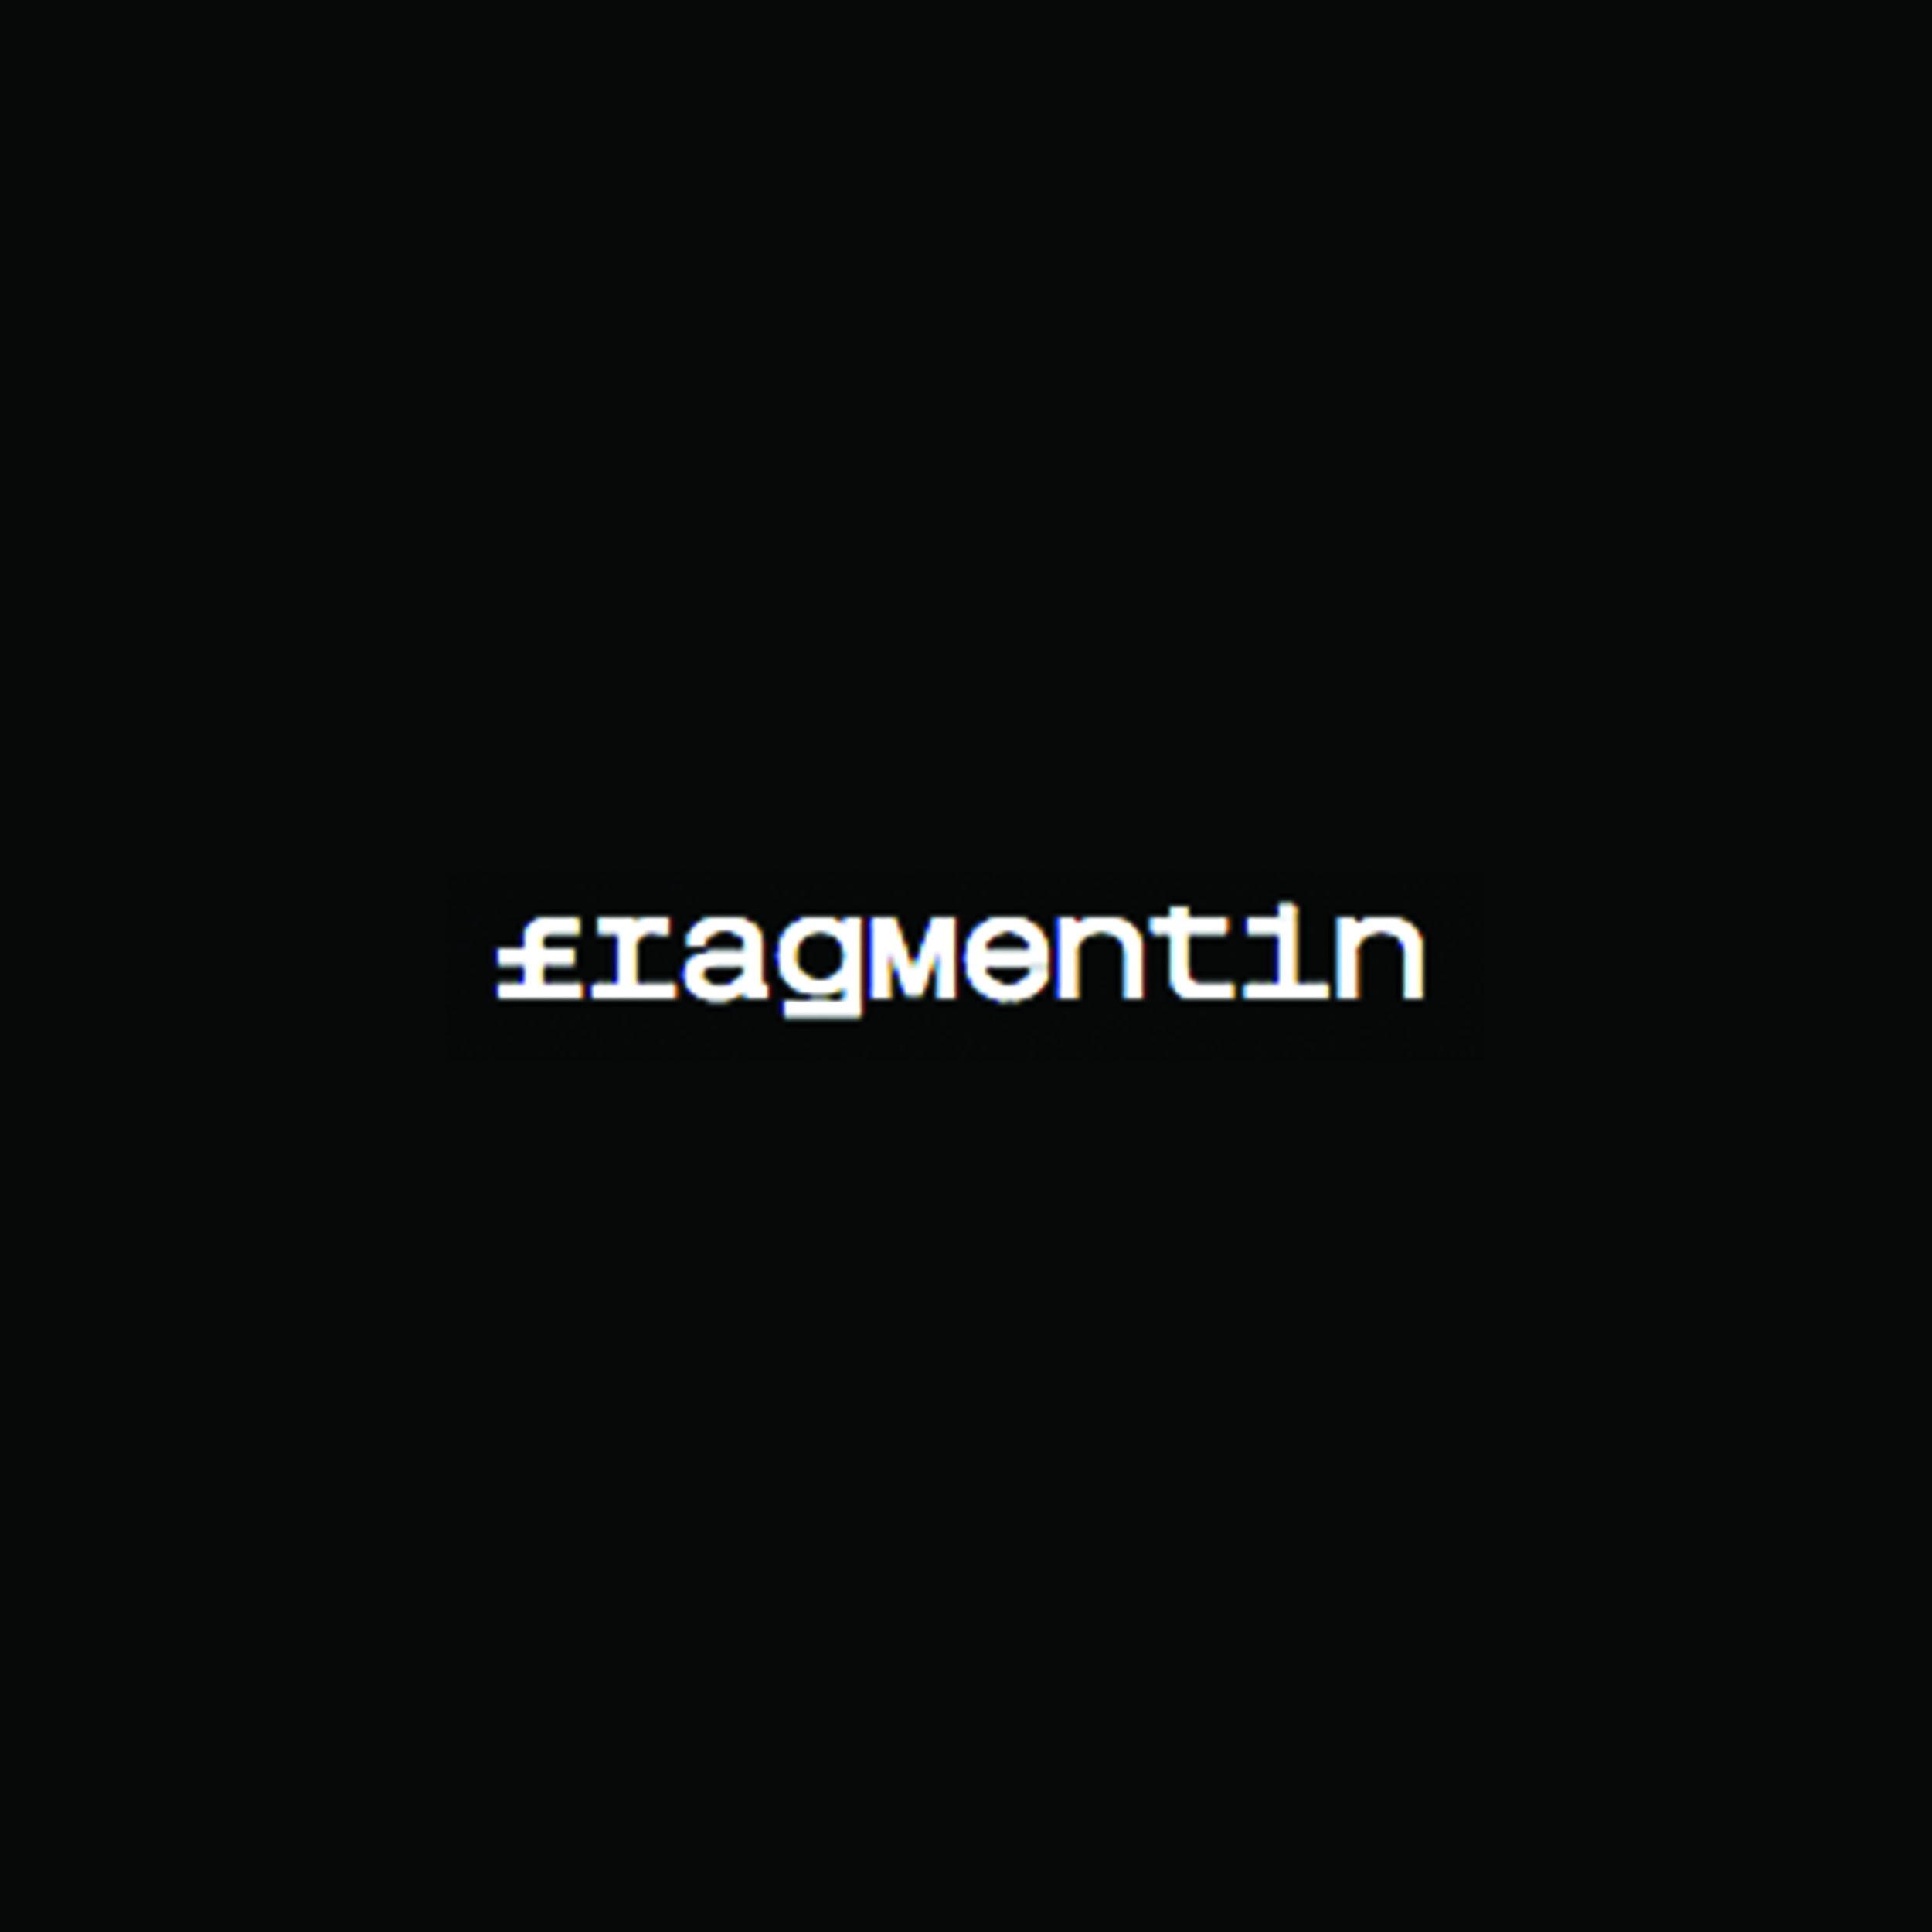 logo_fragmentin_141.jpg